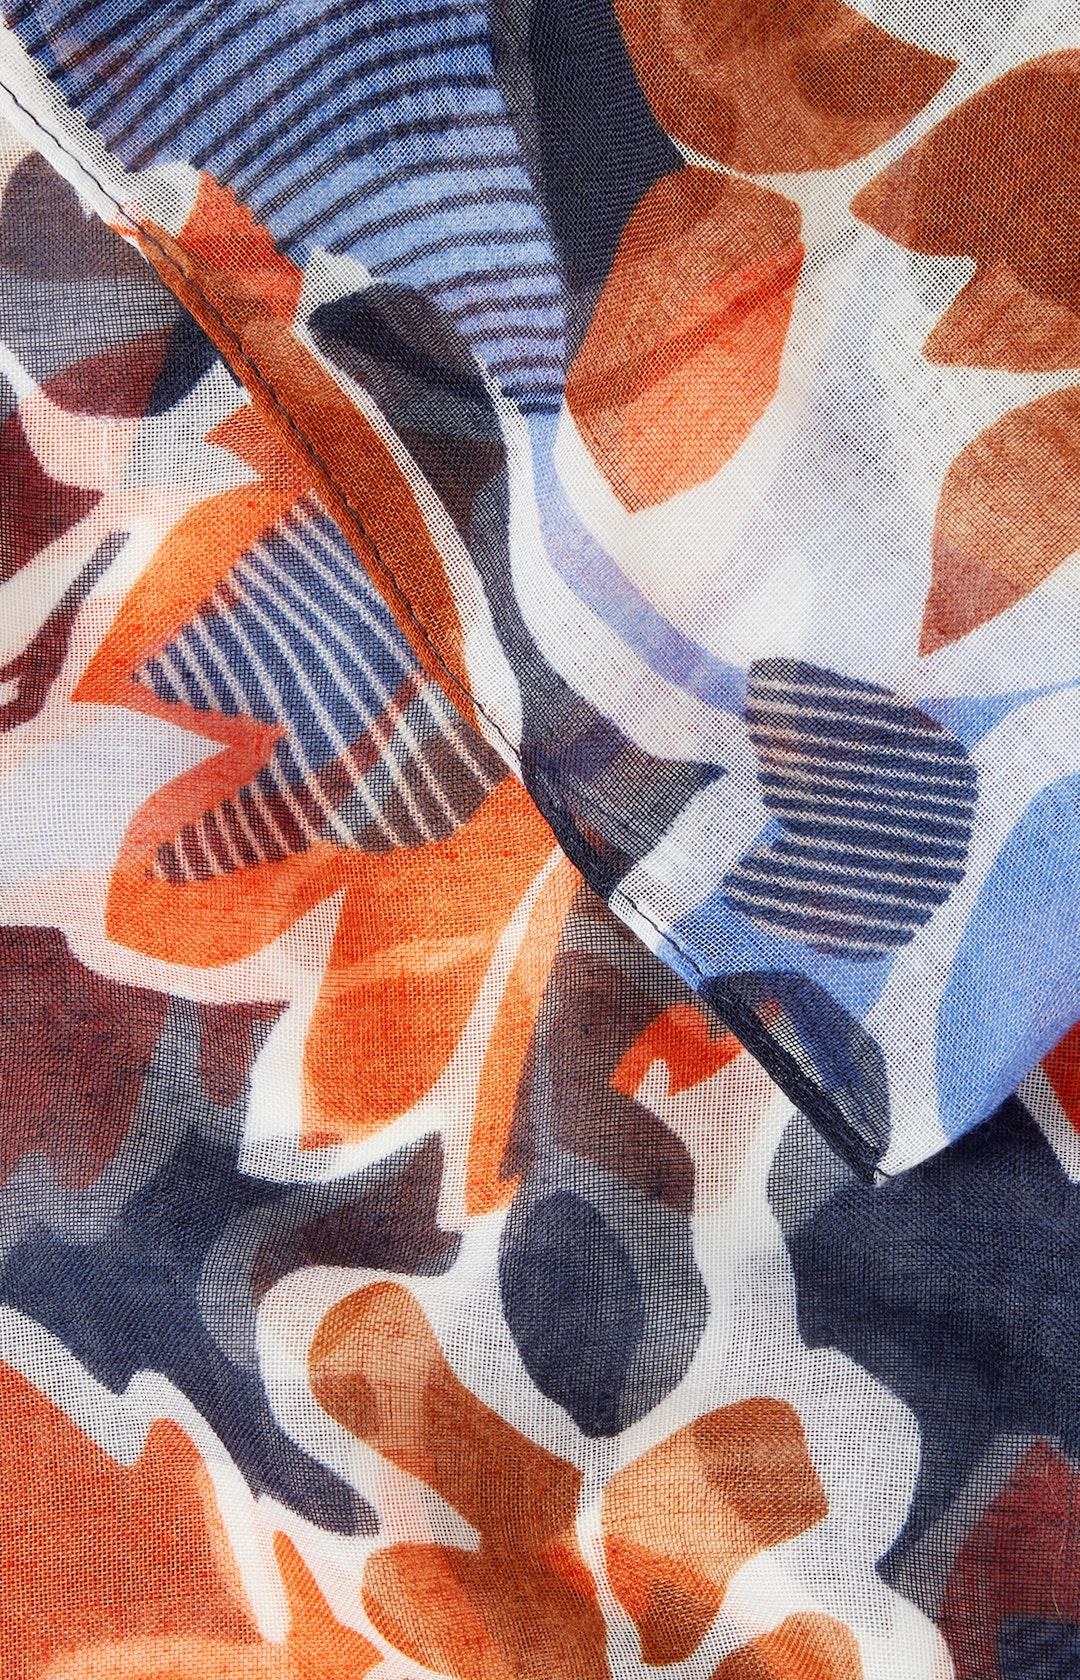 Loop Schal mit Allover-Muster in Blau